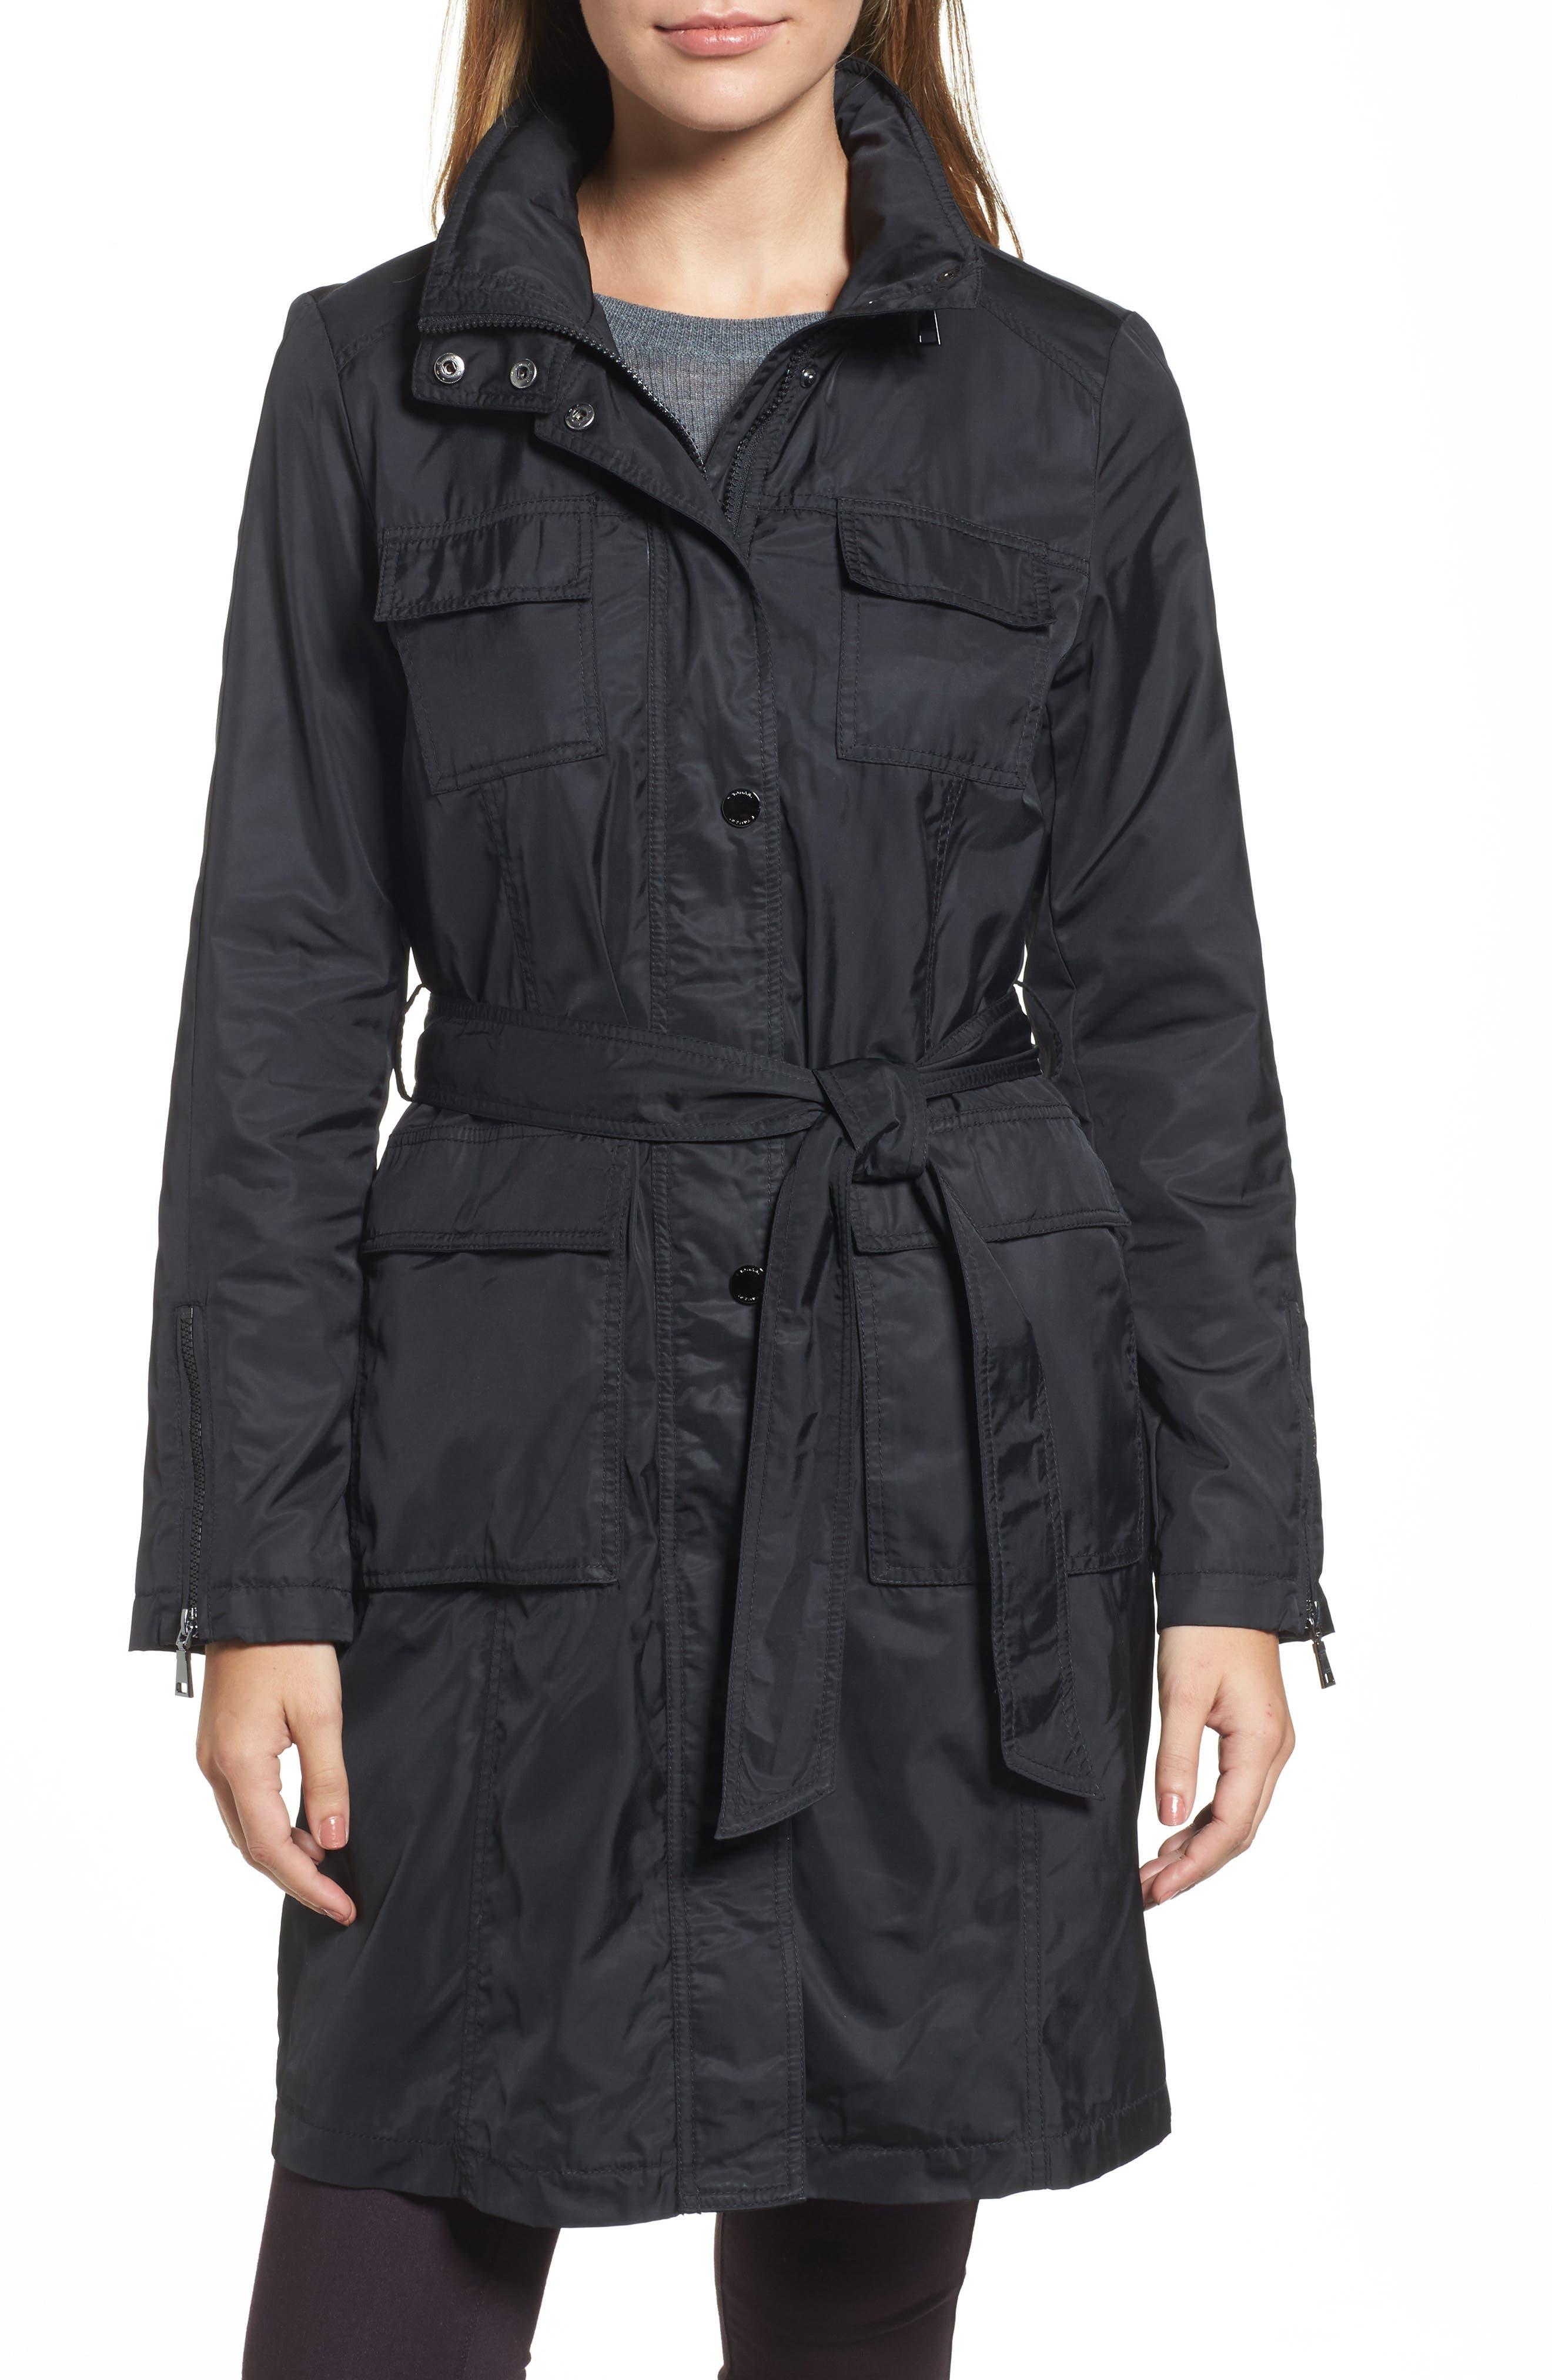 Giselle Stowaway Hood Rain Anorak,                         Main,                         color,